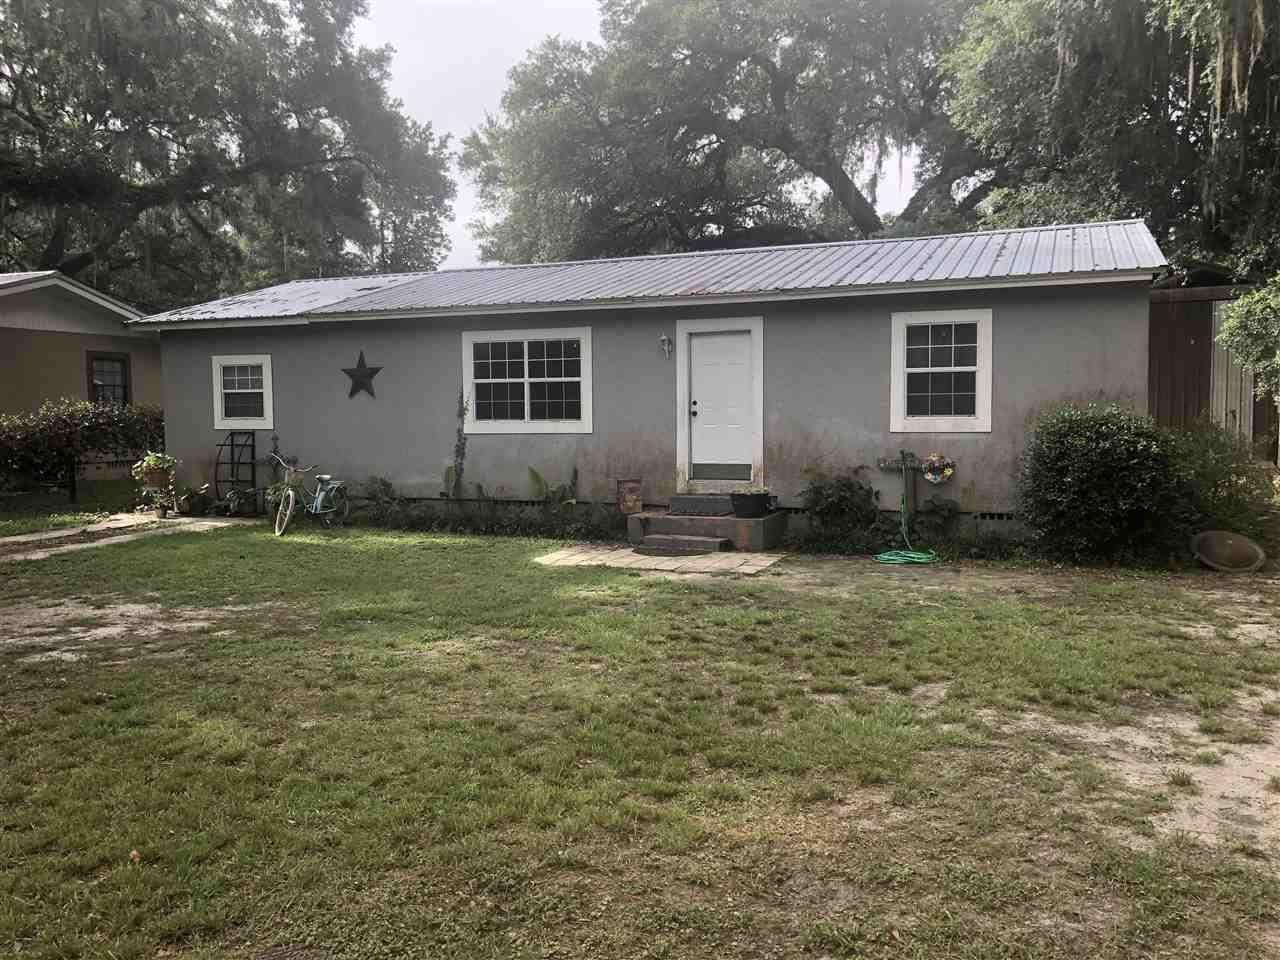 911 Veterans Dr. N Drive, Perry, FL 32347 - MLS#: 333789